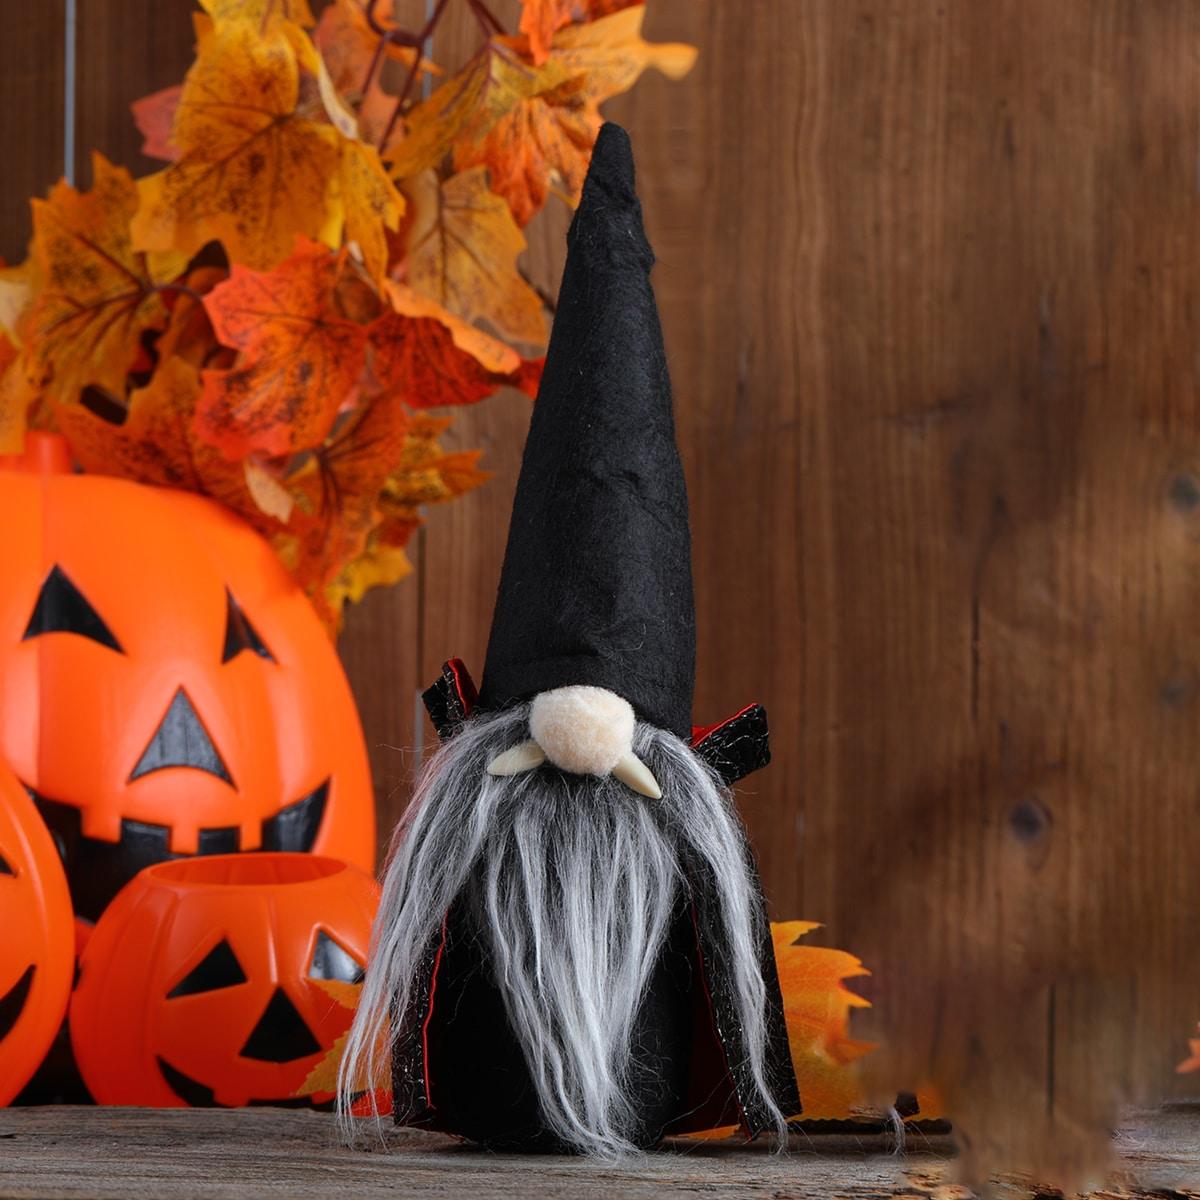 Орнамент в форме гнома на хэллоуин